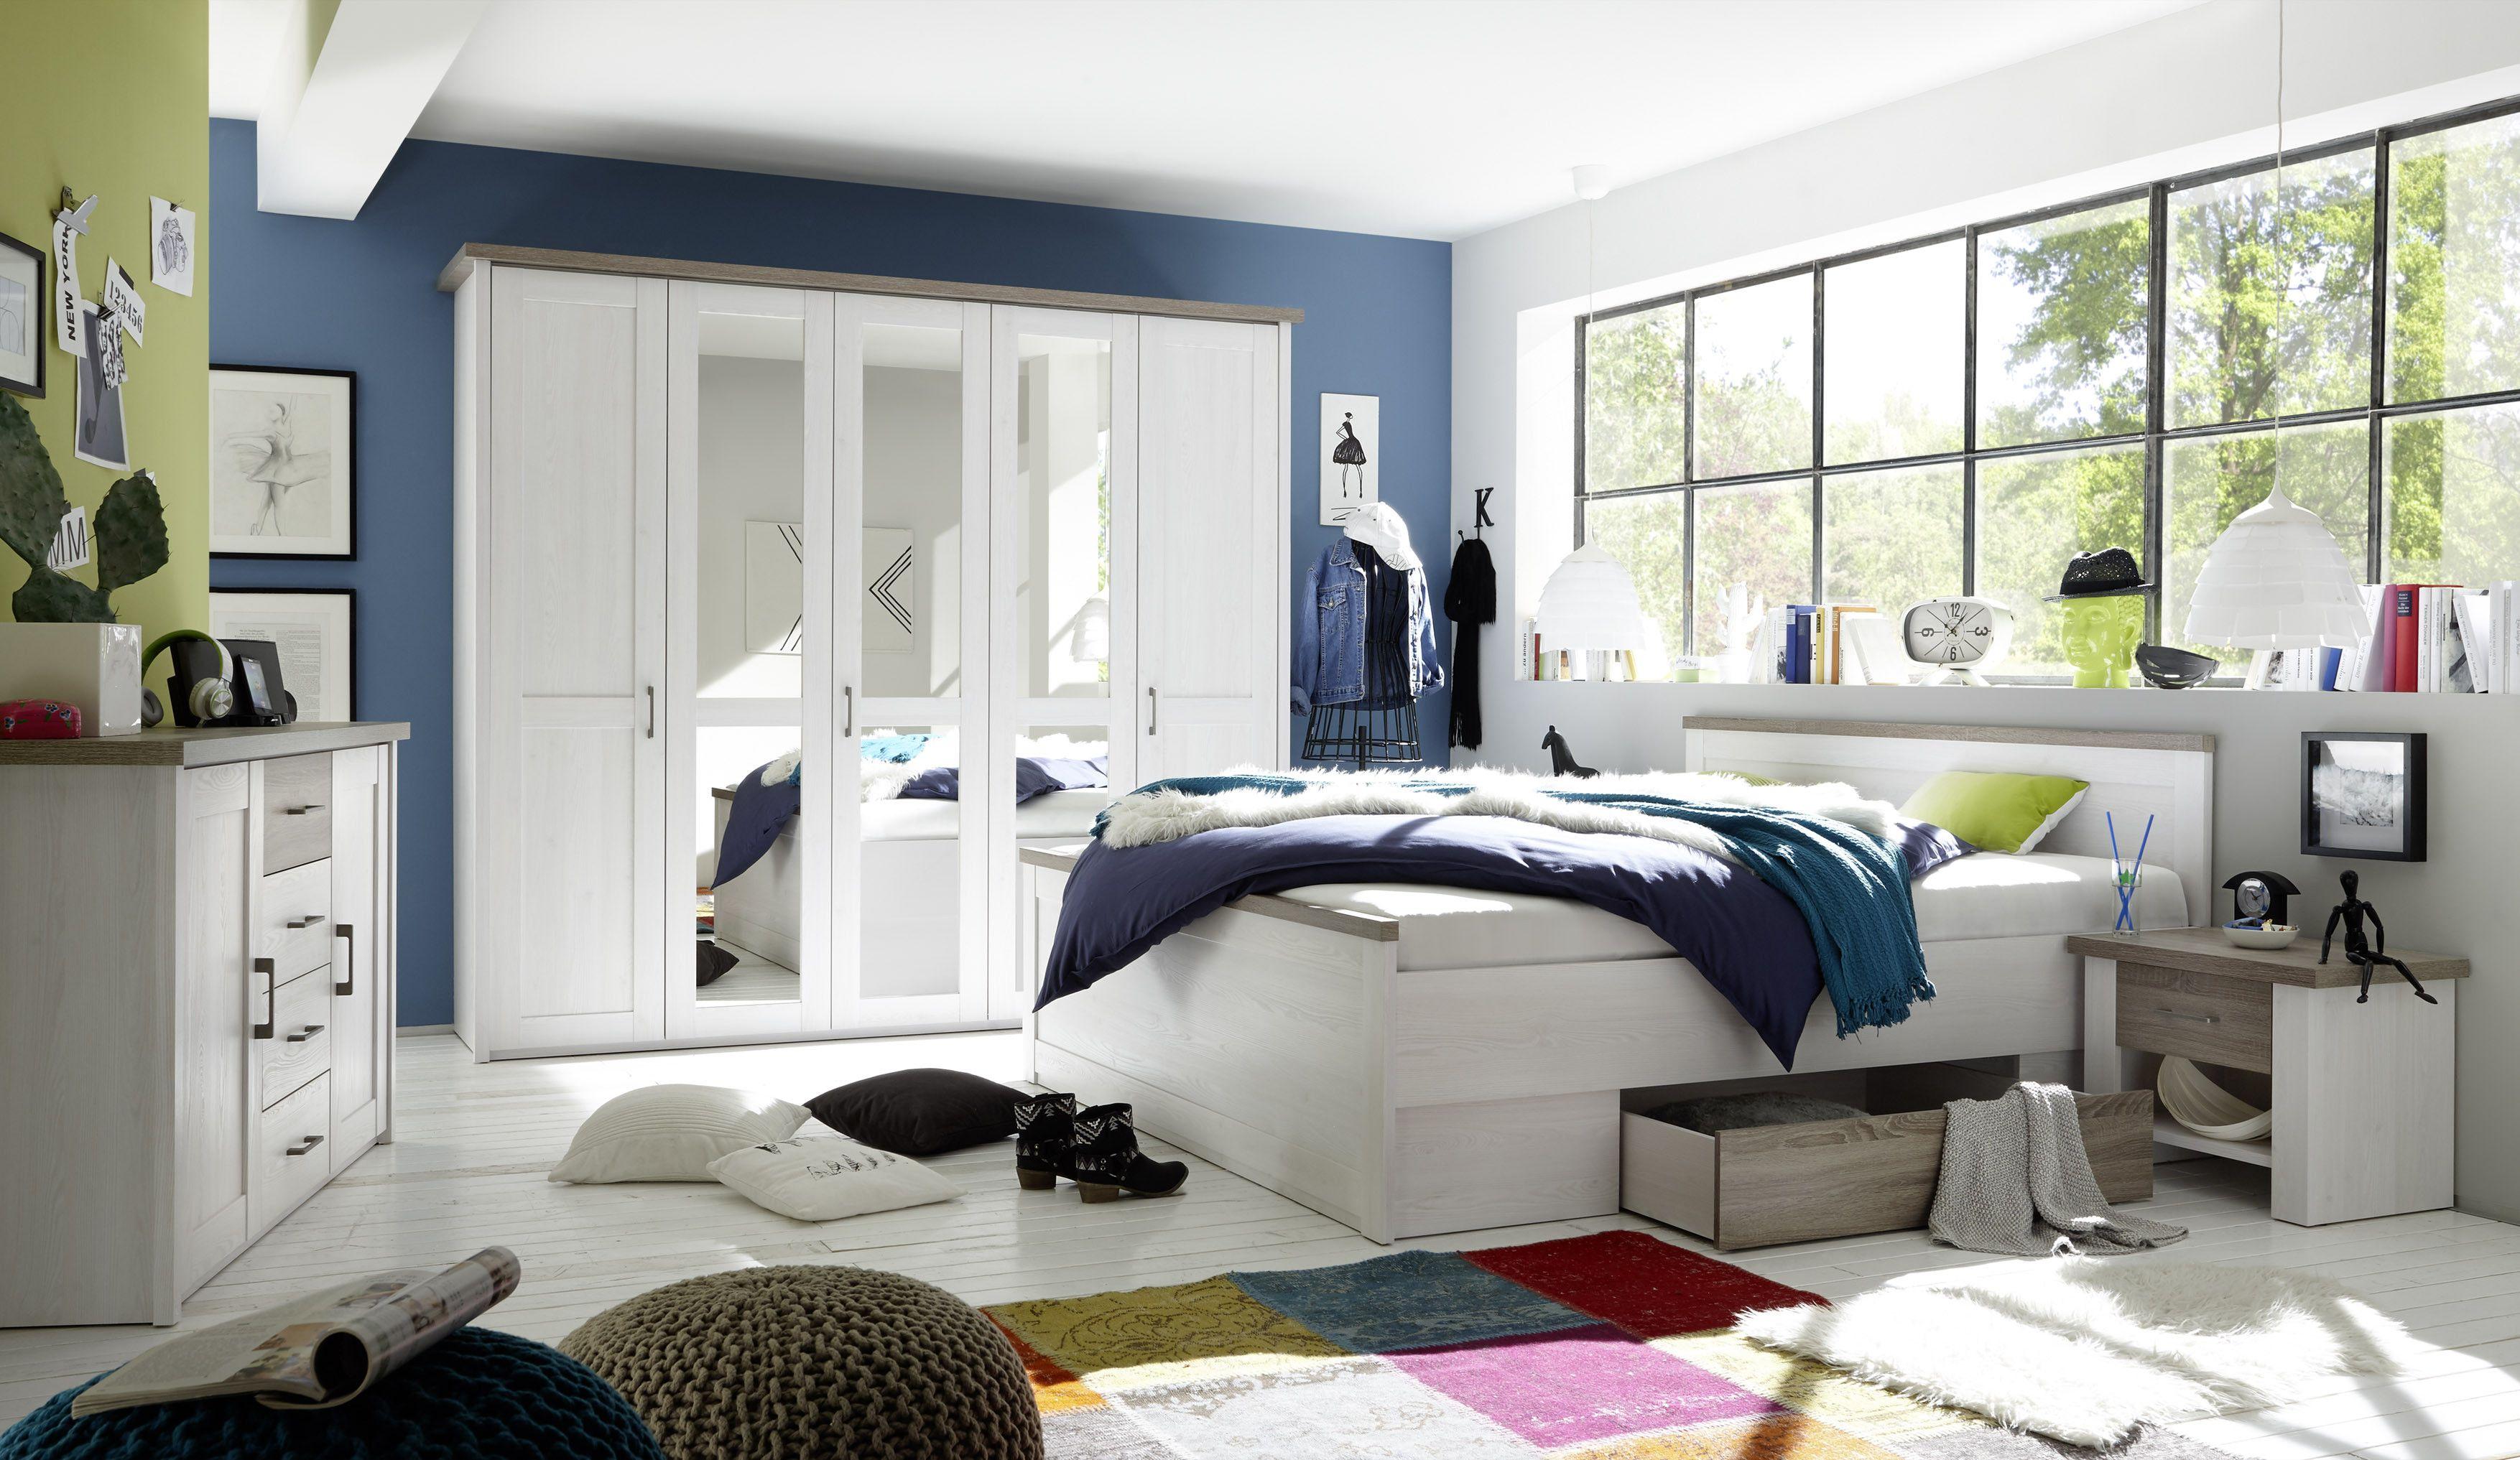 Schlafzimmer Komplett Set Inspirational Schlafzimmer Komplett Set 5 Tlg Bett 180 Kleiderschrank Di 2020